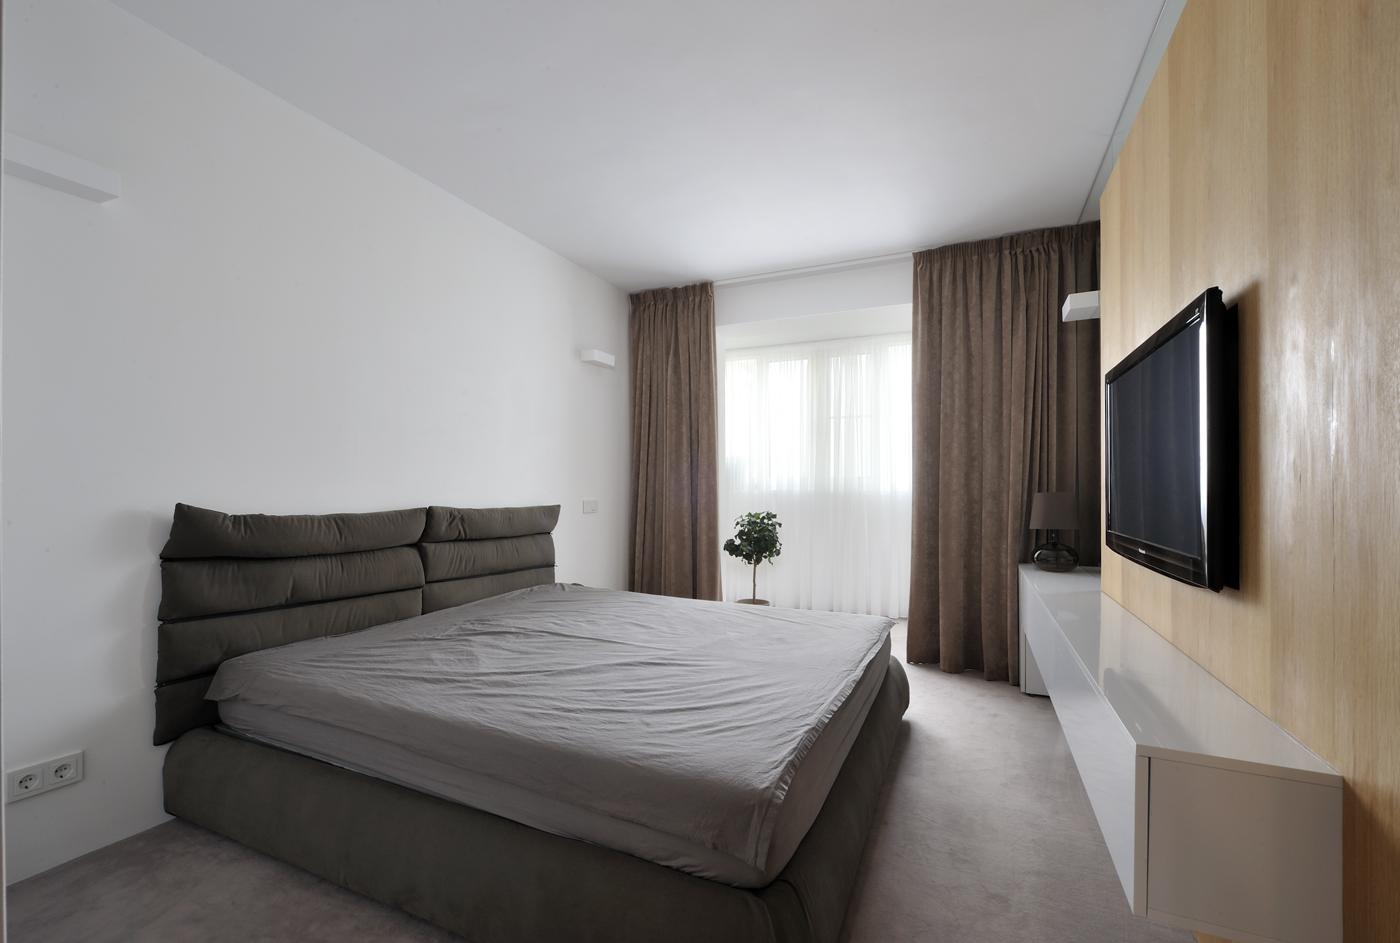 20 Best Small Modern Bedroom Ideas - Architecture Beast on Teenager Simple Small Bedroom Design  id=15758